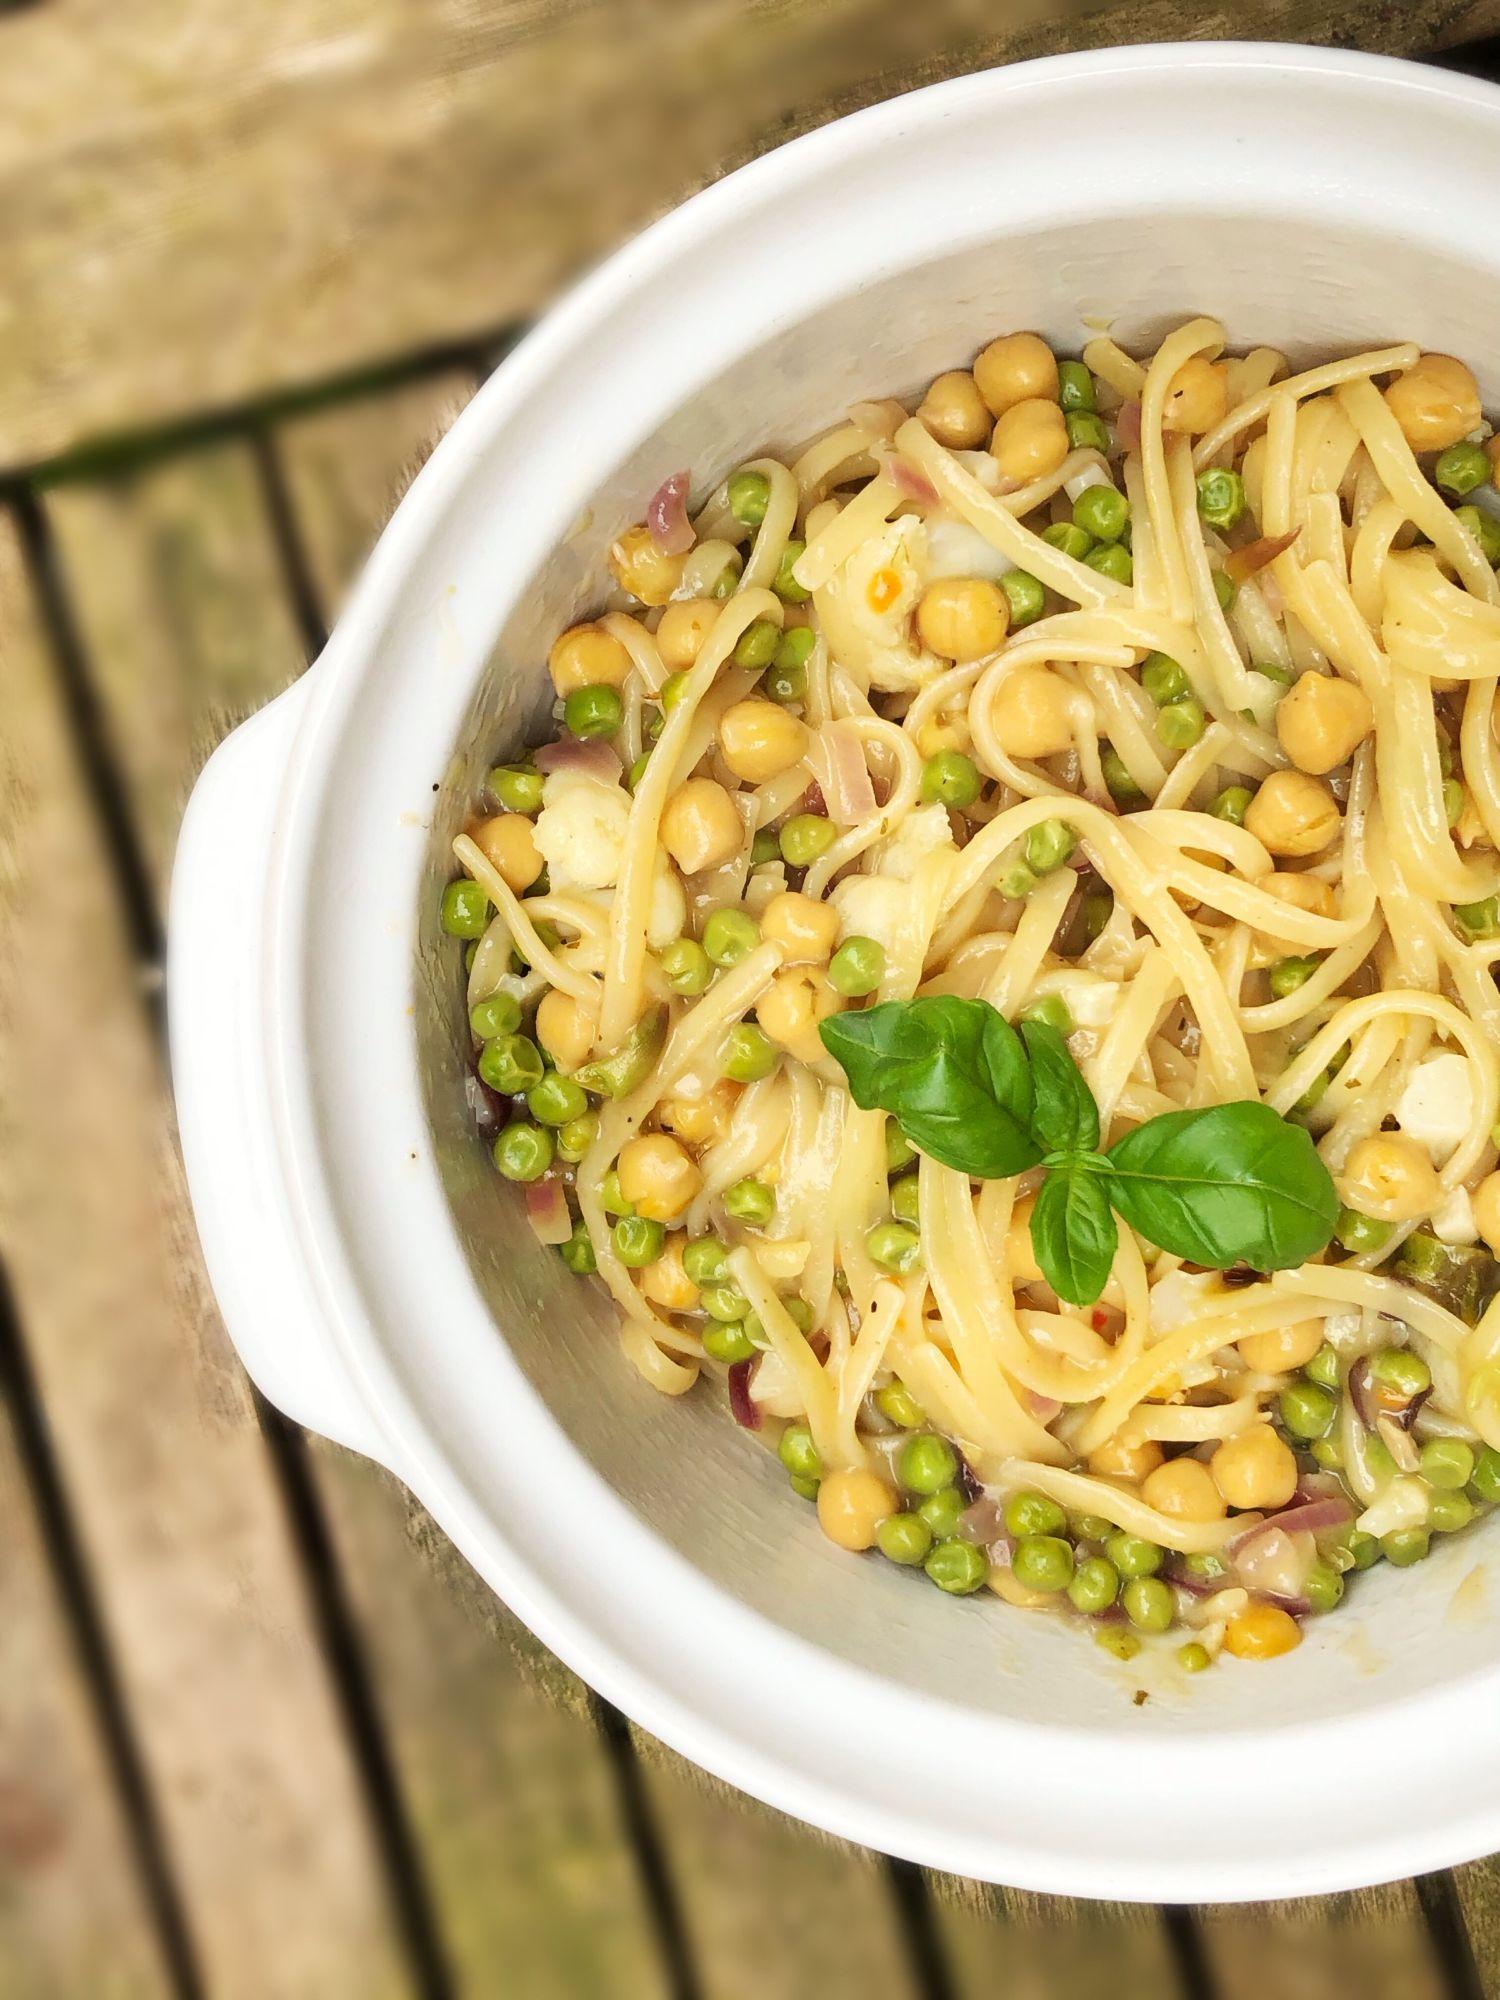 Lemon and Vegetable pasta